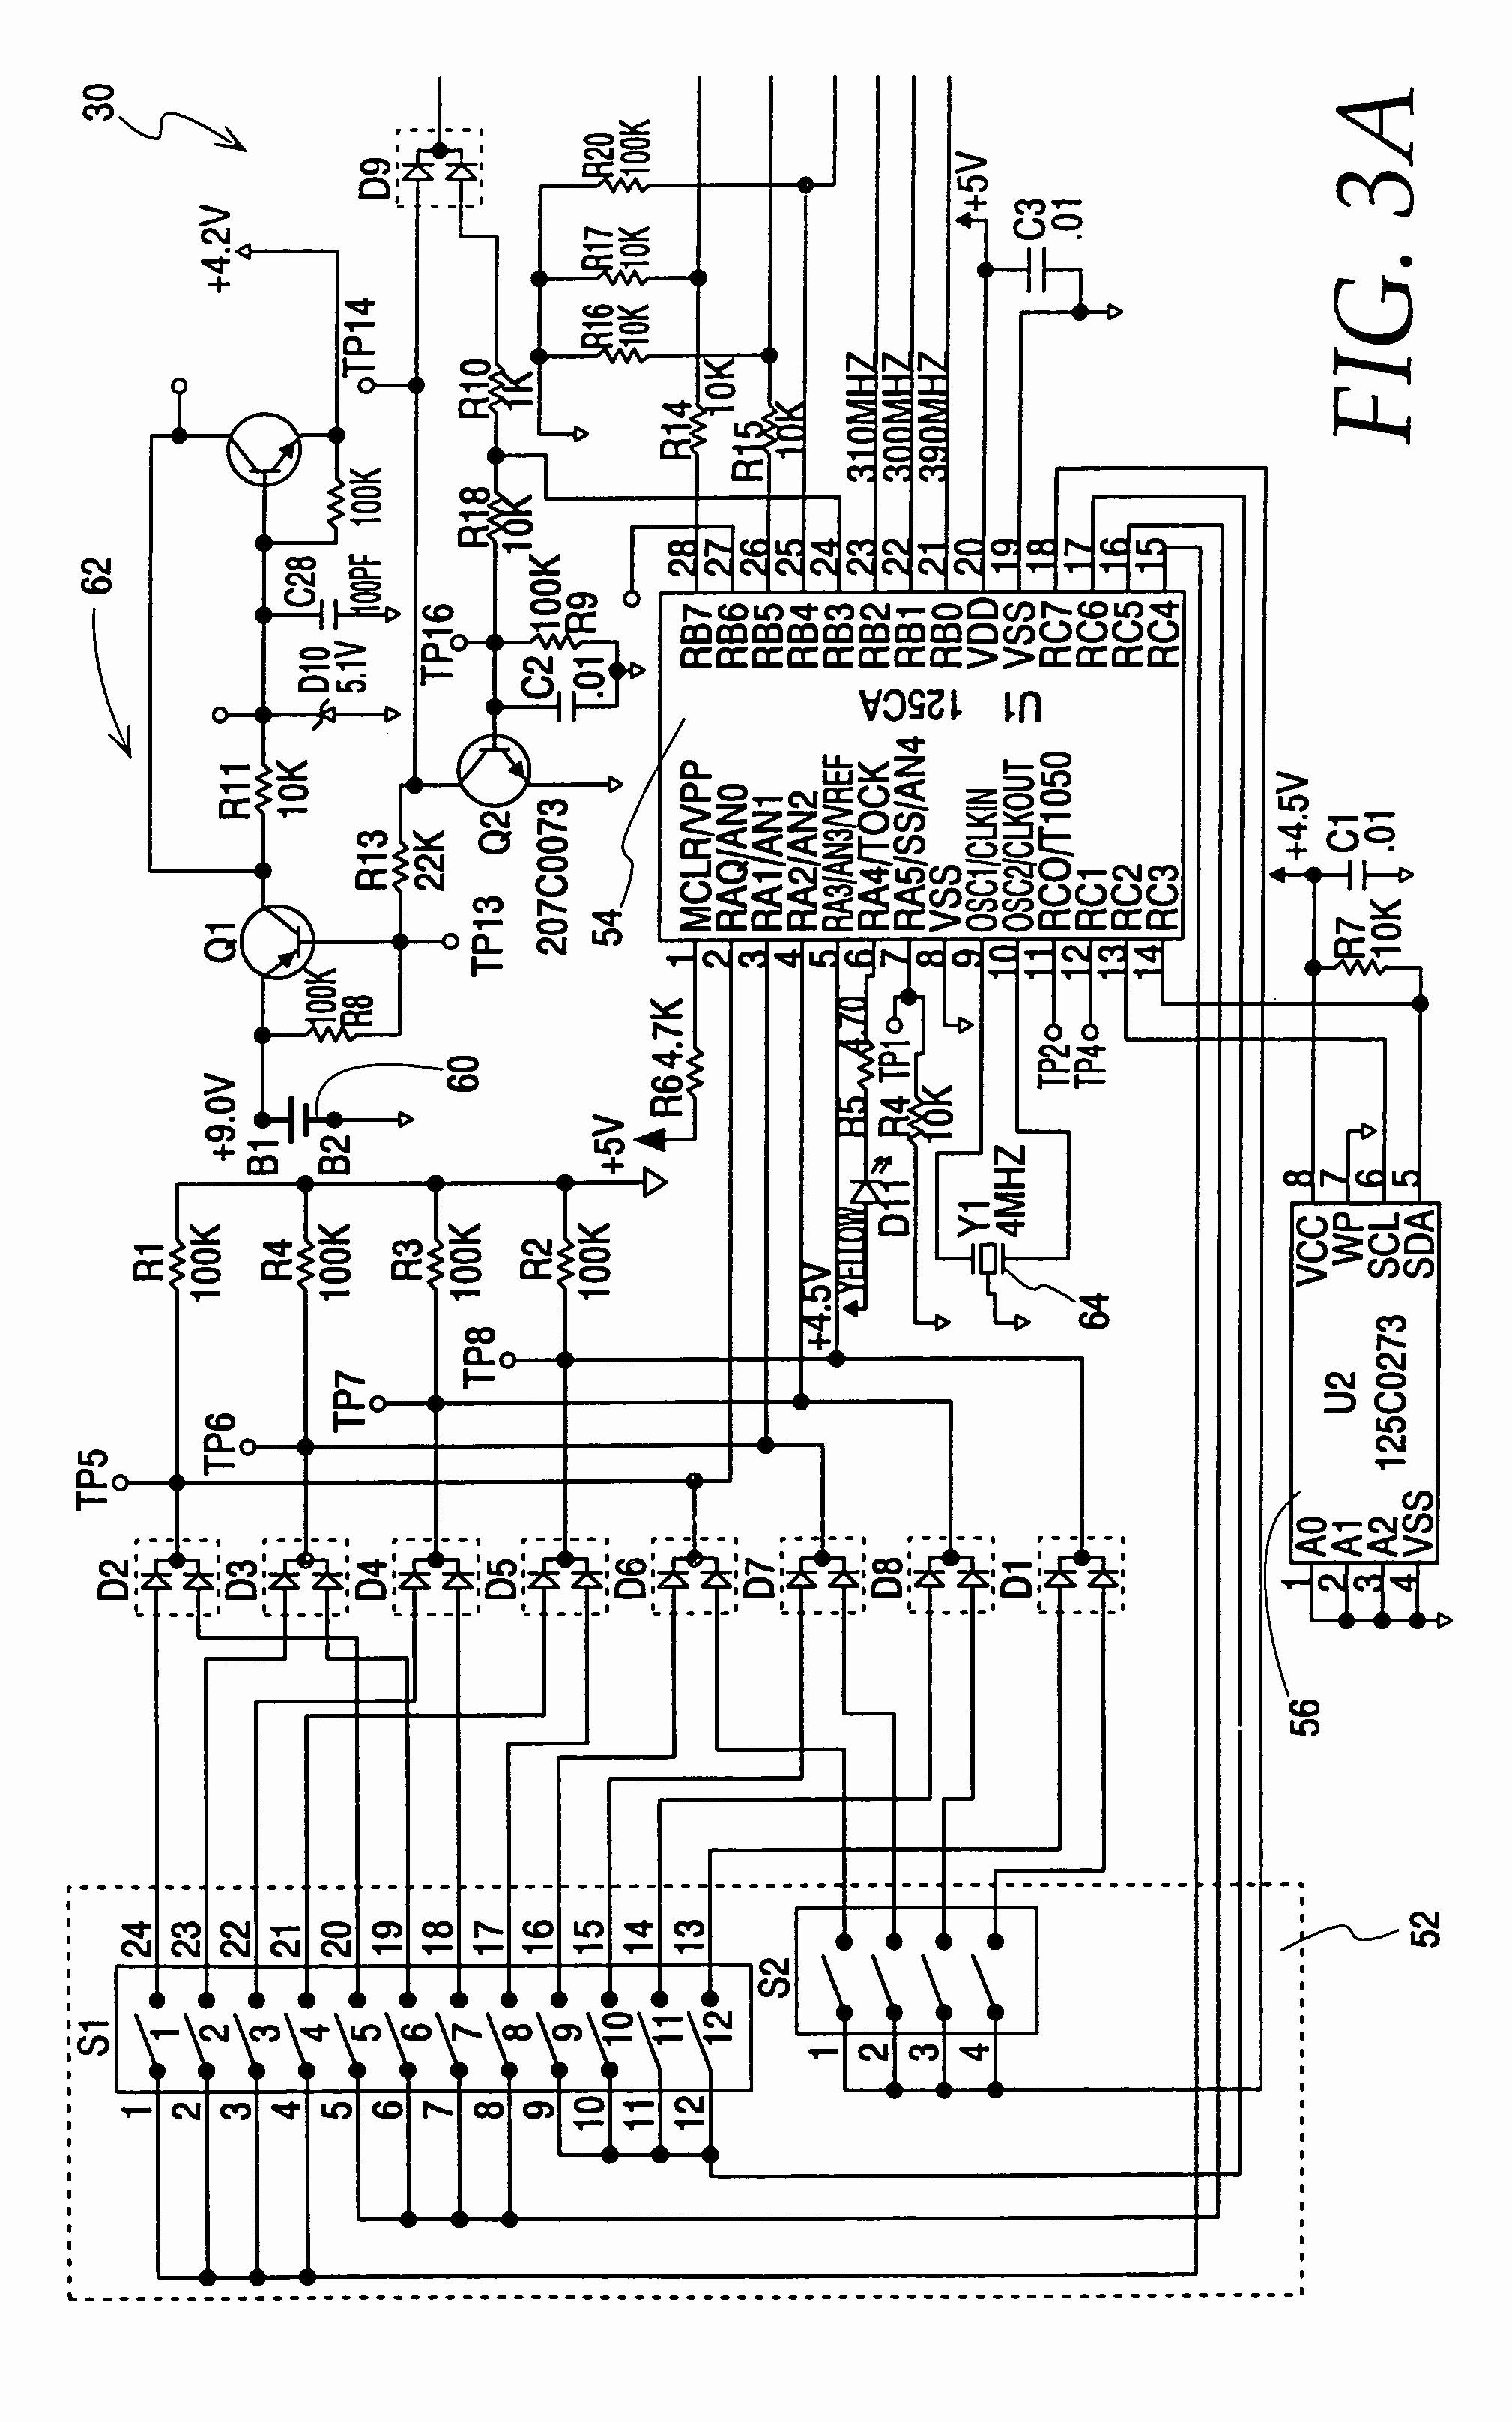 For Garage Doors Wayne Dalton Wiring Diagram - Fusebox and Wiring Diagram  schematic-device - schematic-device.id-architects.itdiagram database - id-architects.it